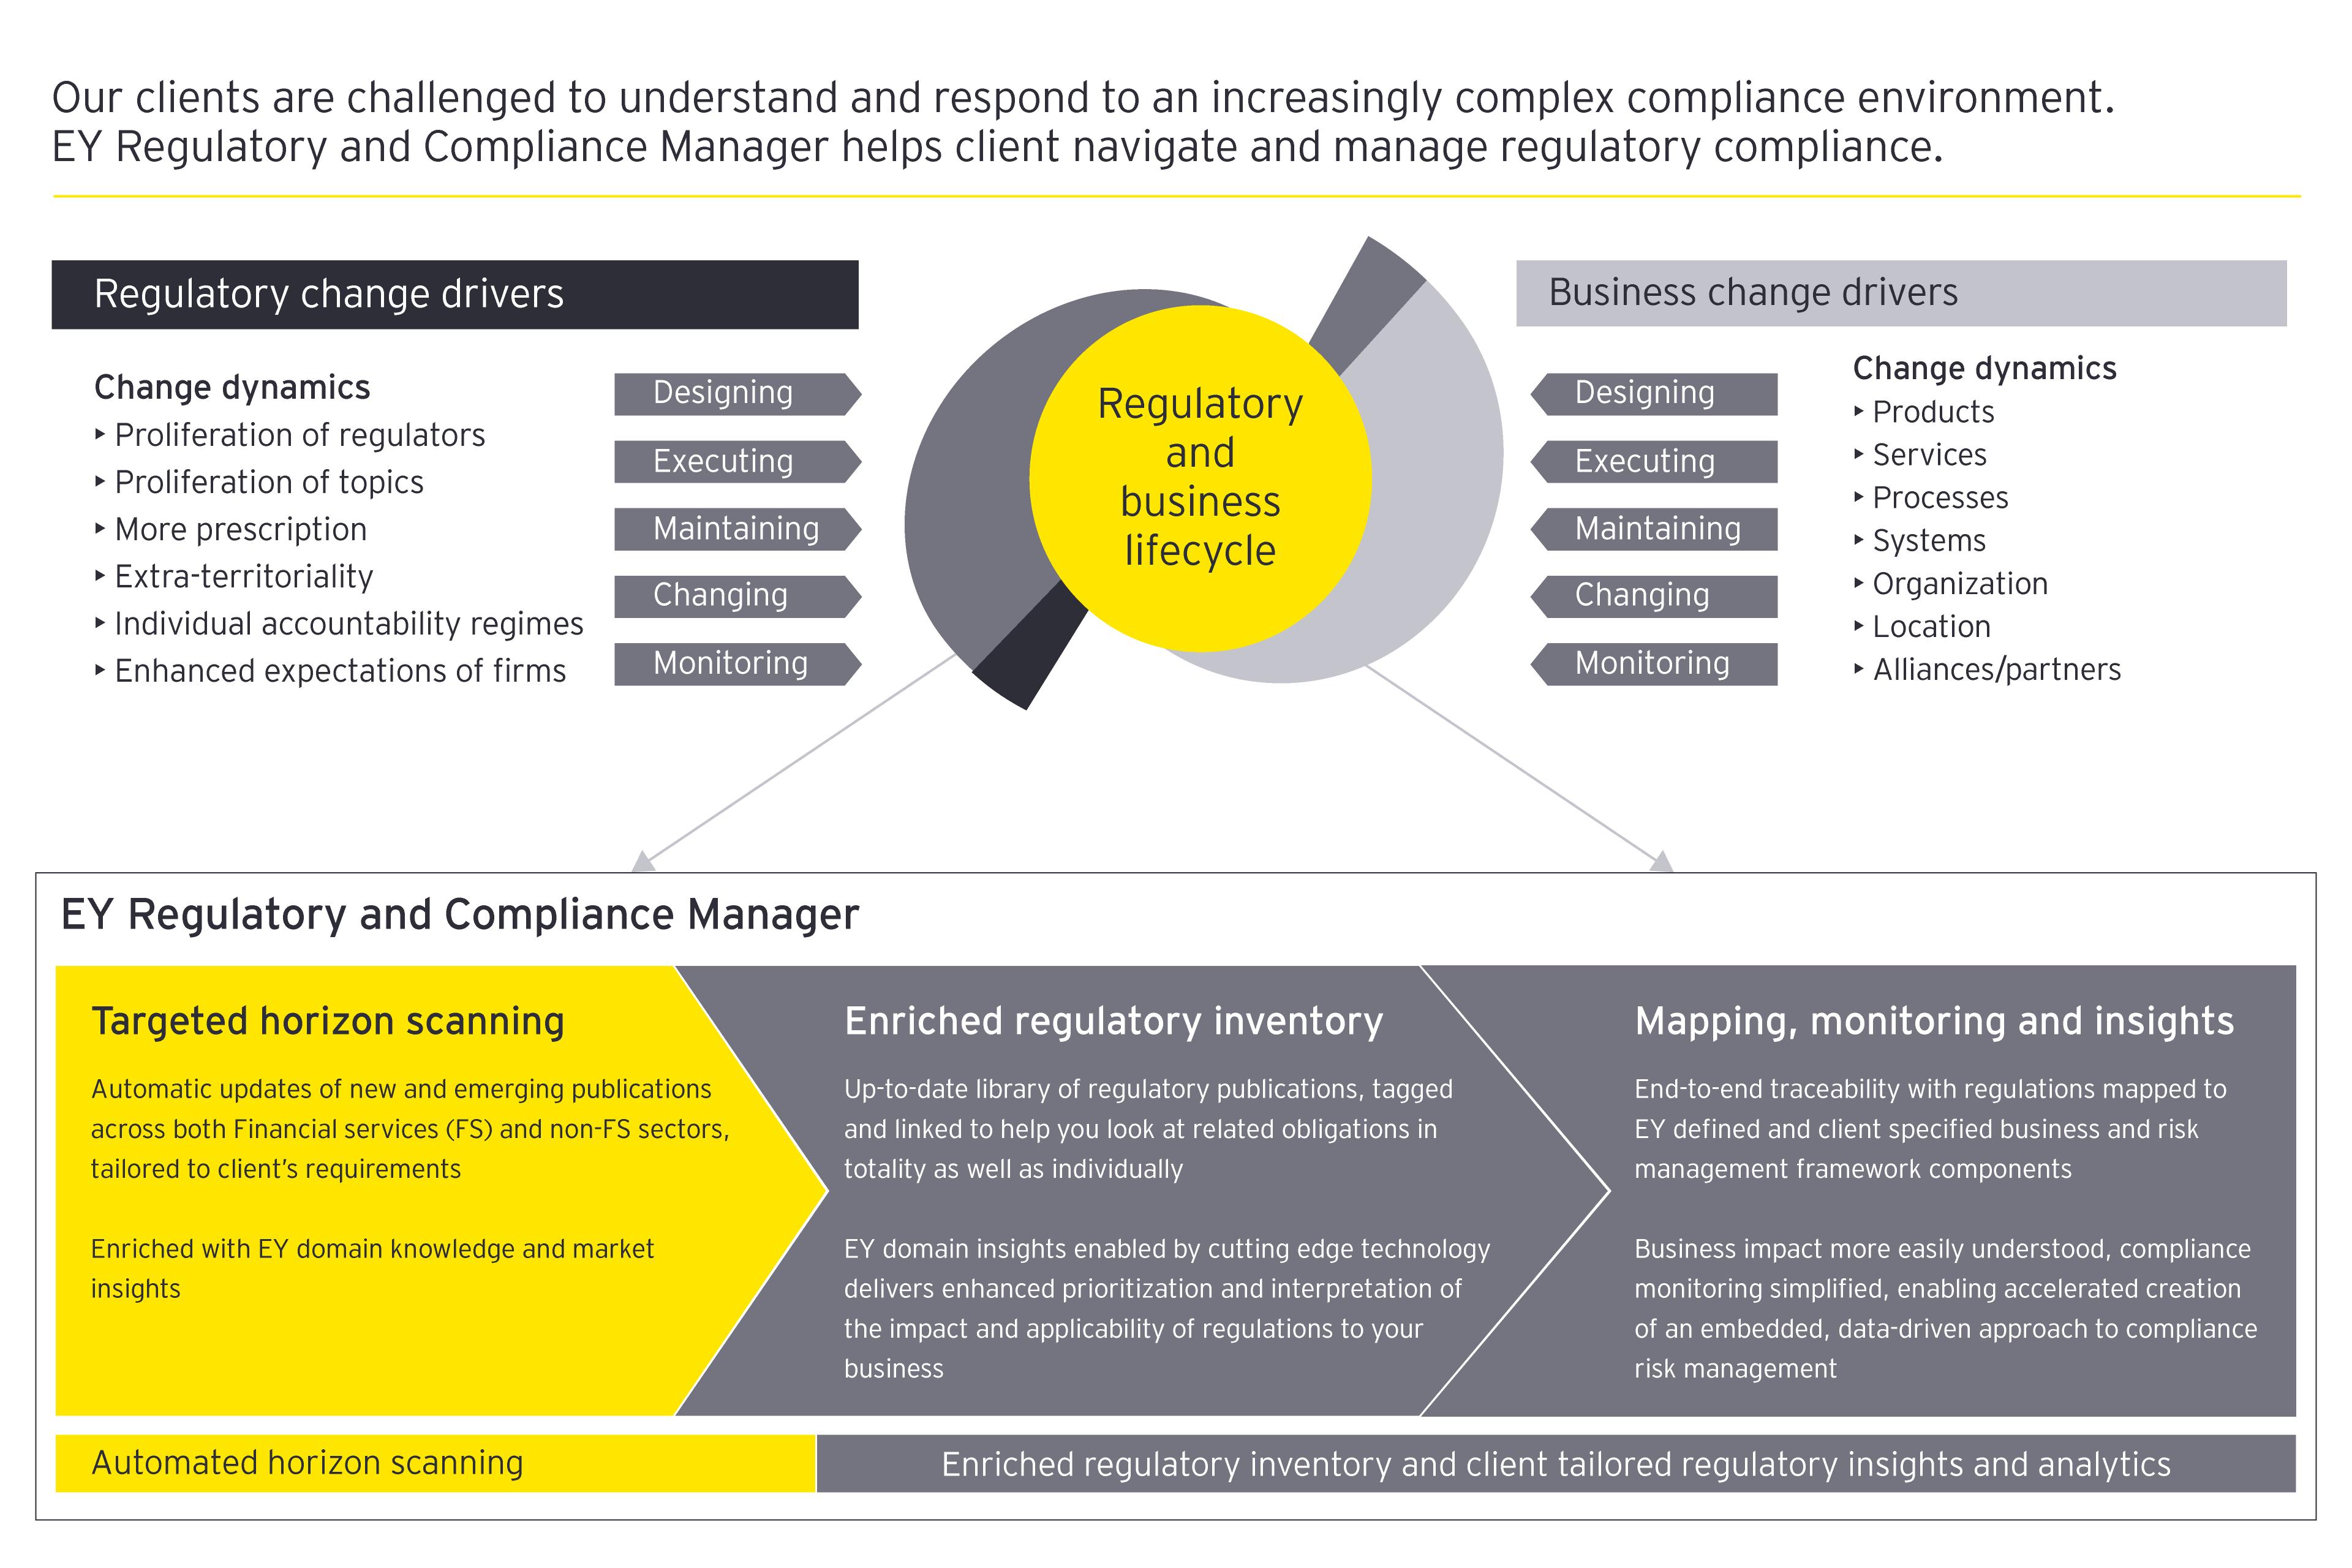 Regulatory and business lifecycle